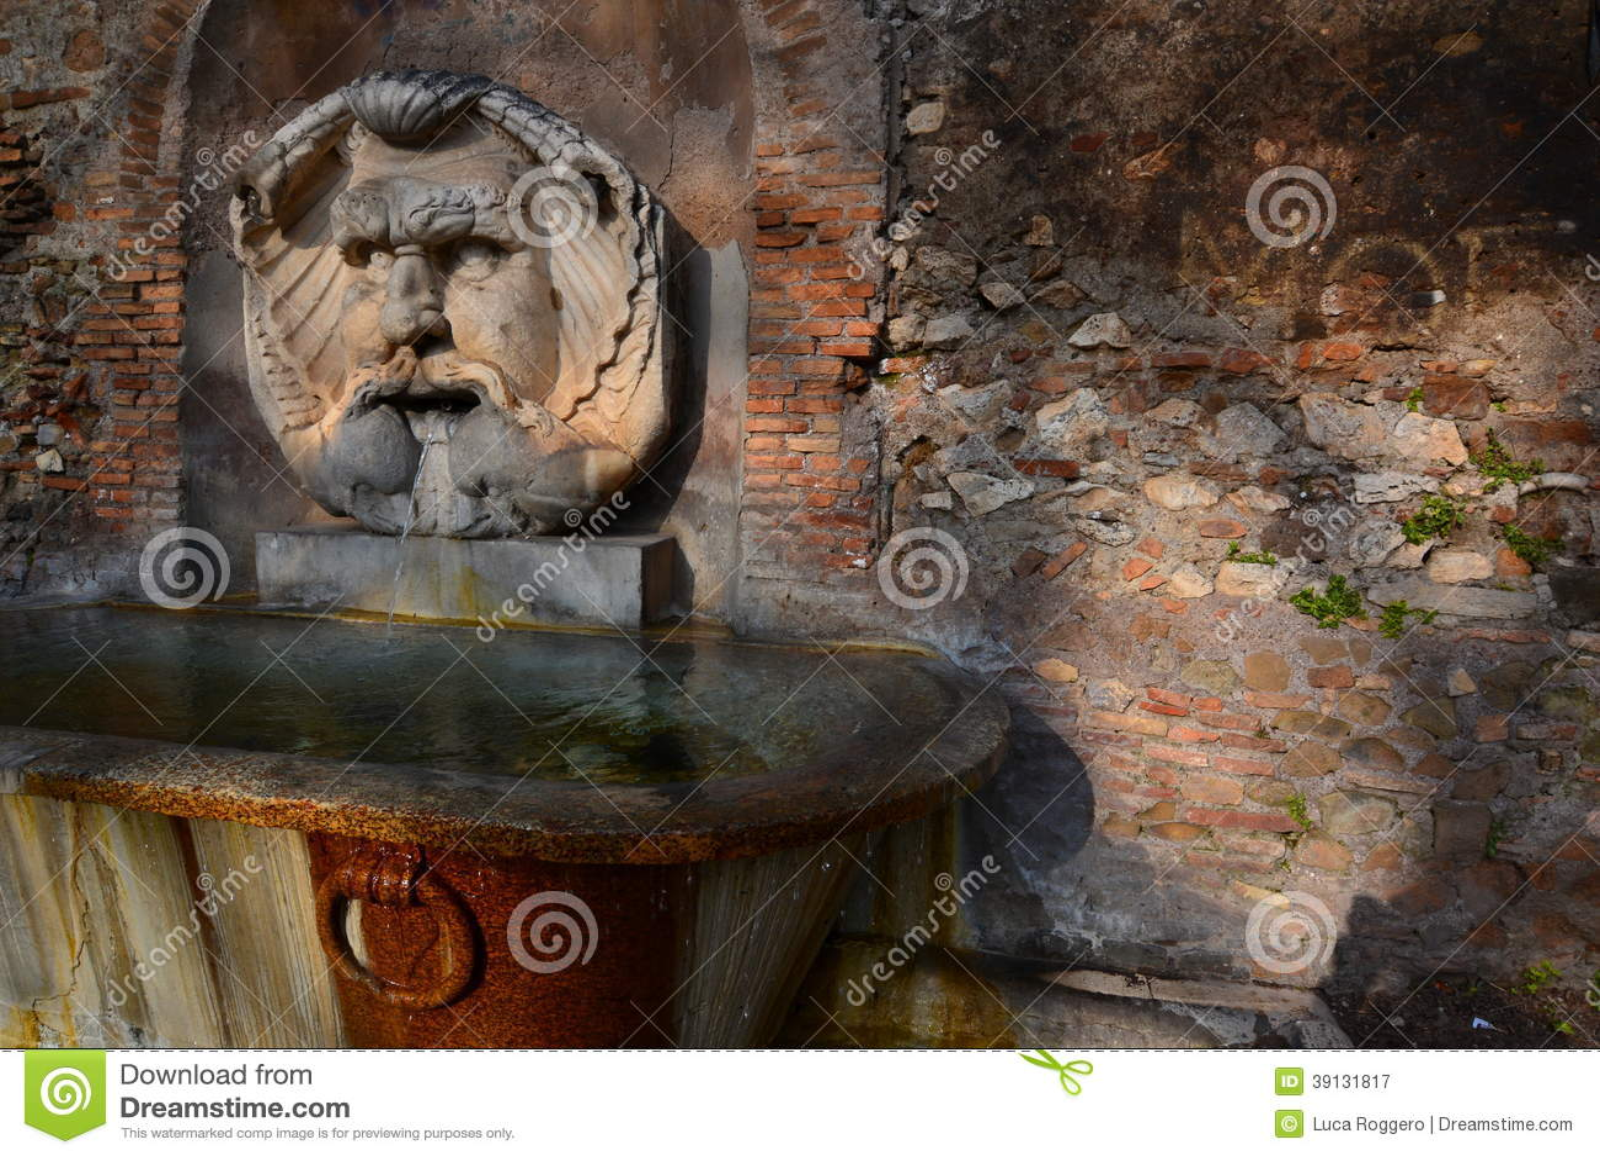 Ancient fountain giardino degli aranci parco sav stock image image of shadow savello 39131817 - Giardino degli aranci frattamaggiore ...